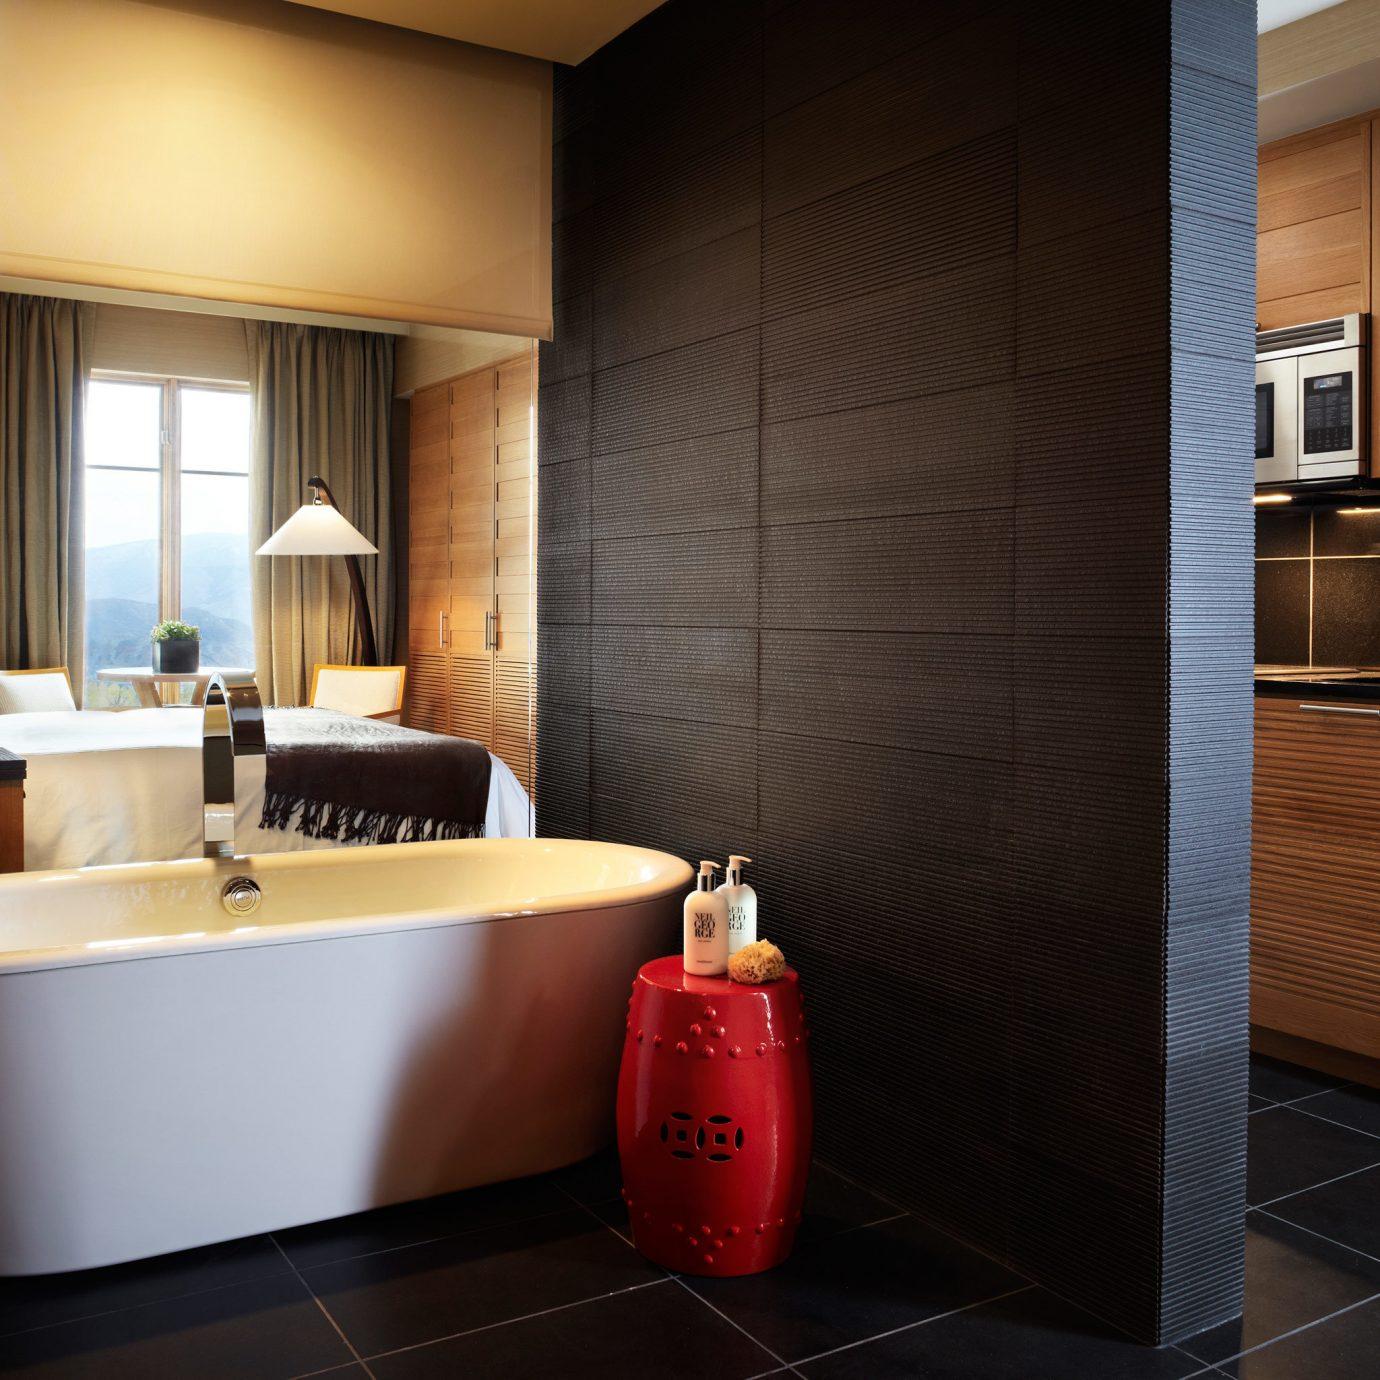 Bath Bedroom Luxury Scenic views bathroom property Suite home bathtub plumbing fixture tub tiled